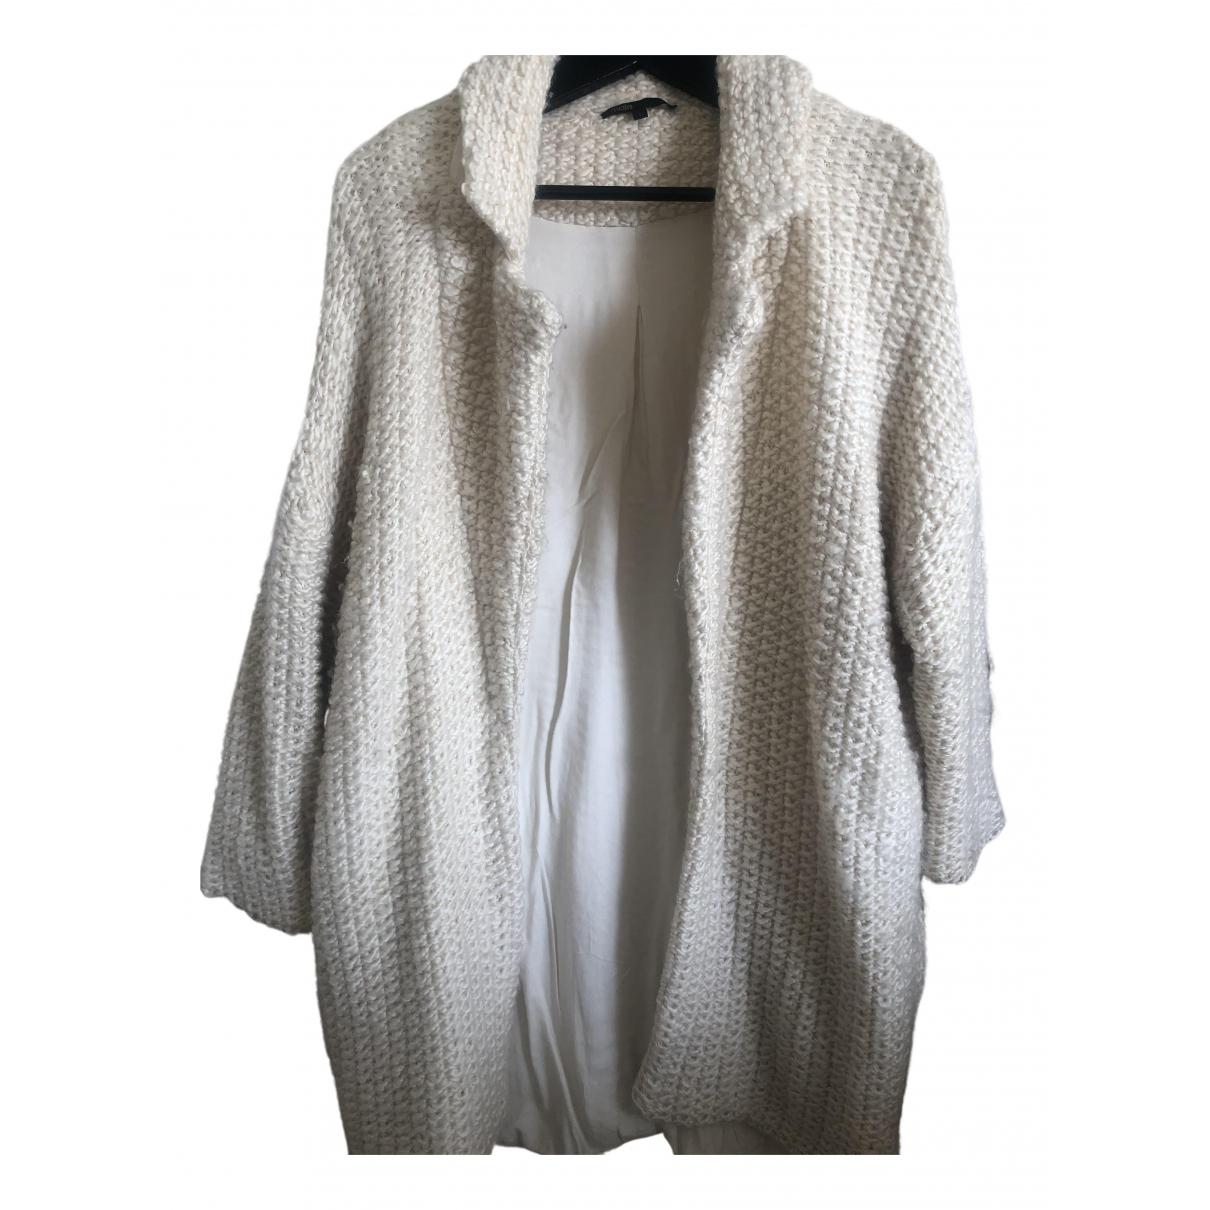 Maje - Veste Fall Winter 2019 pour femme en laine - ecru